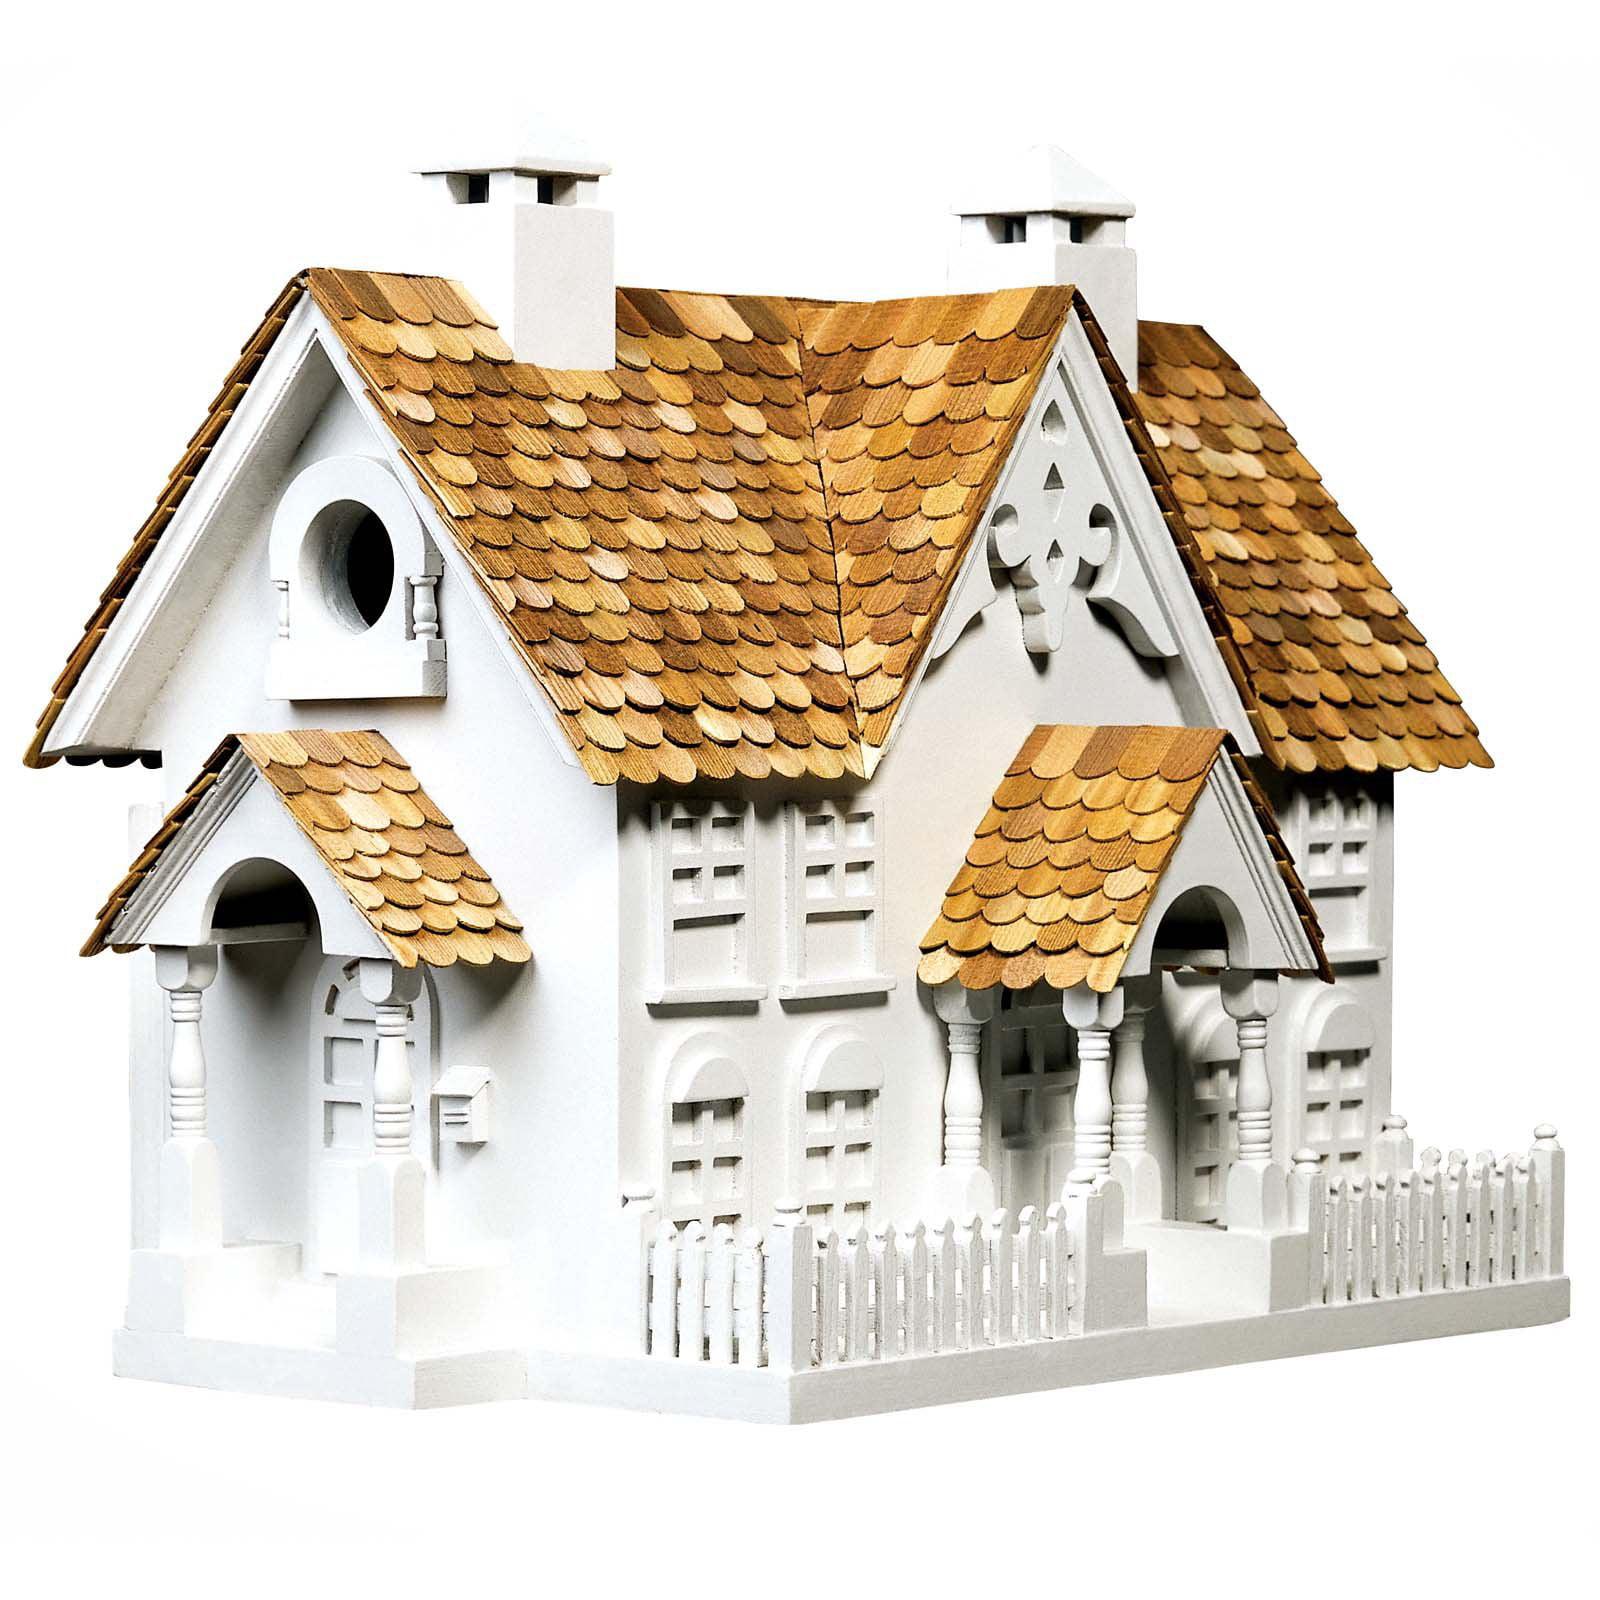 Home Bazaar Wrension Birdhouse by Home Bazaar Inc.